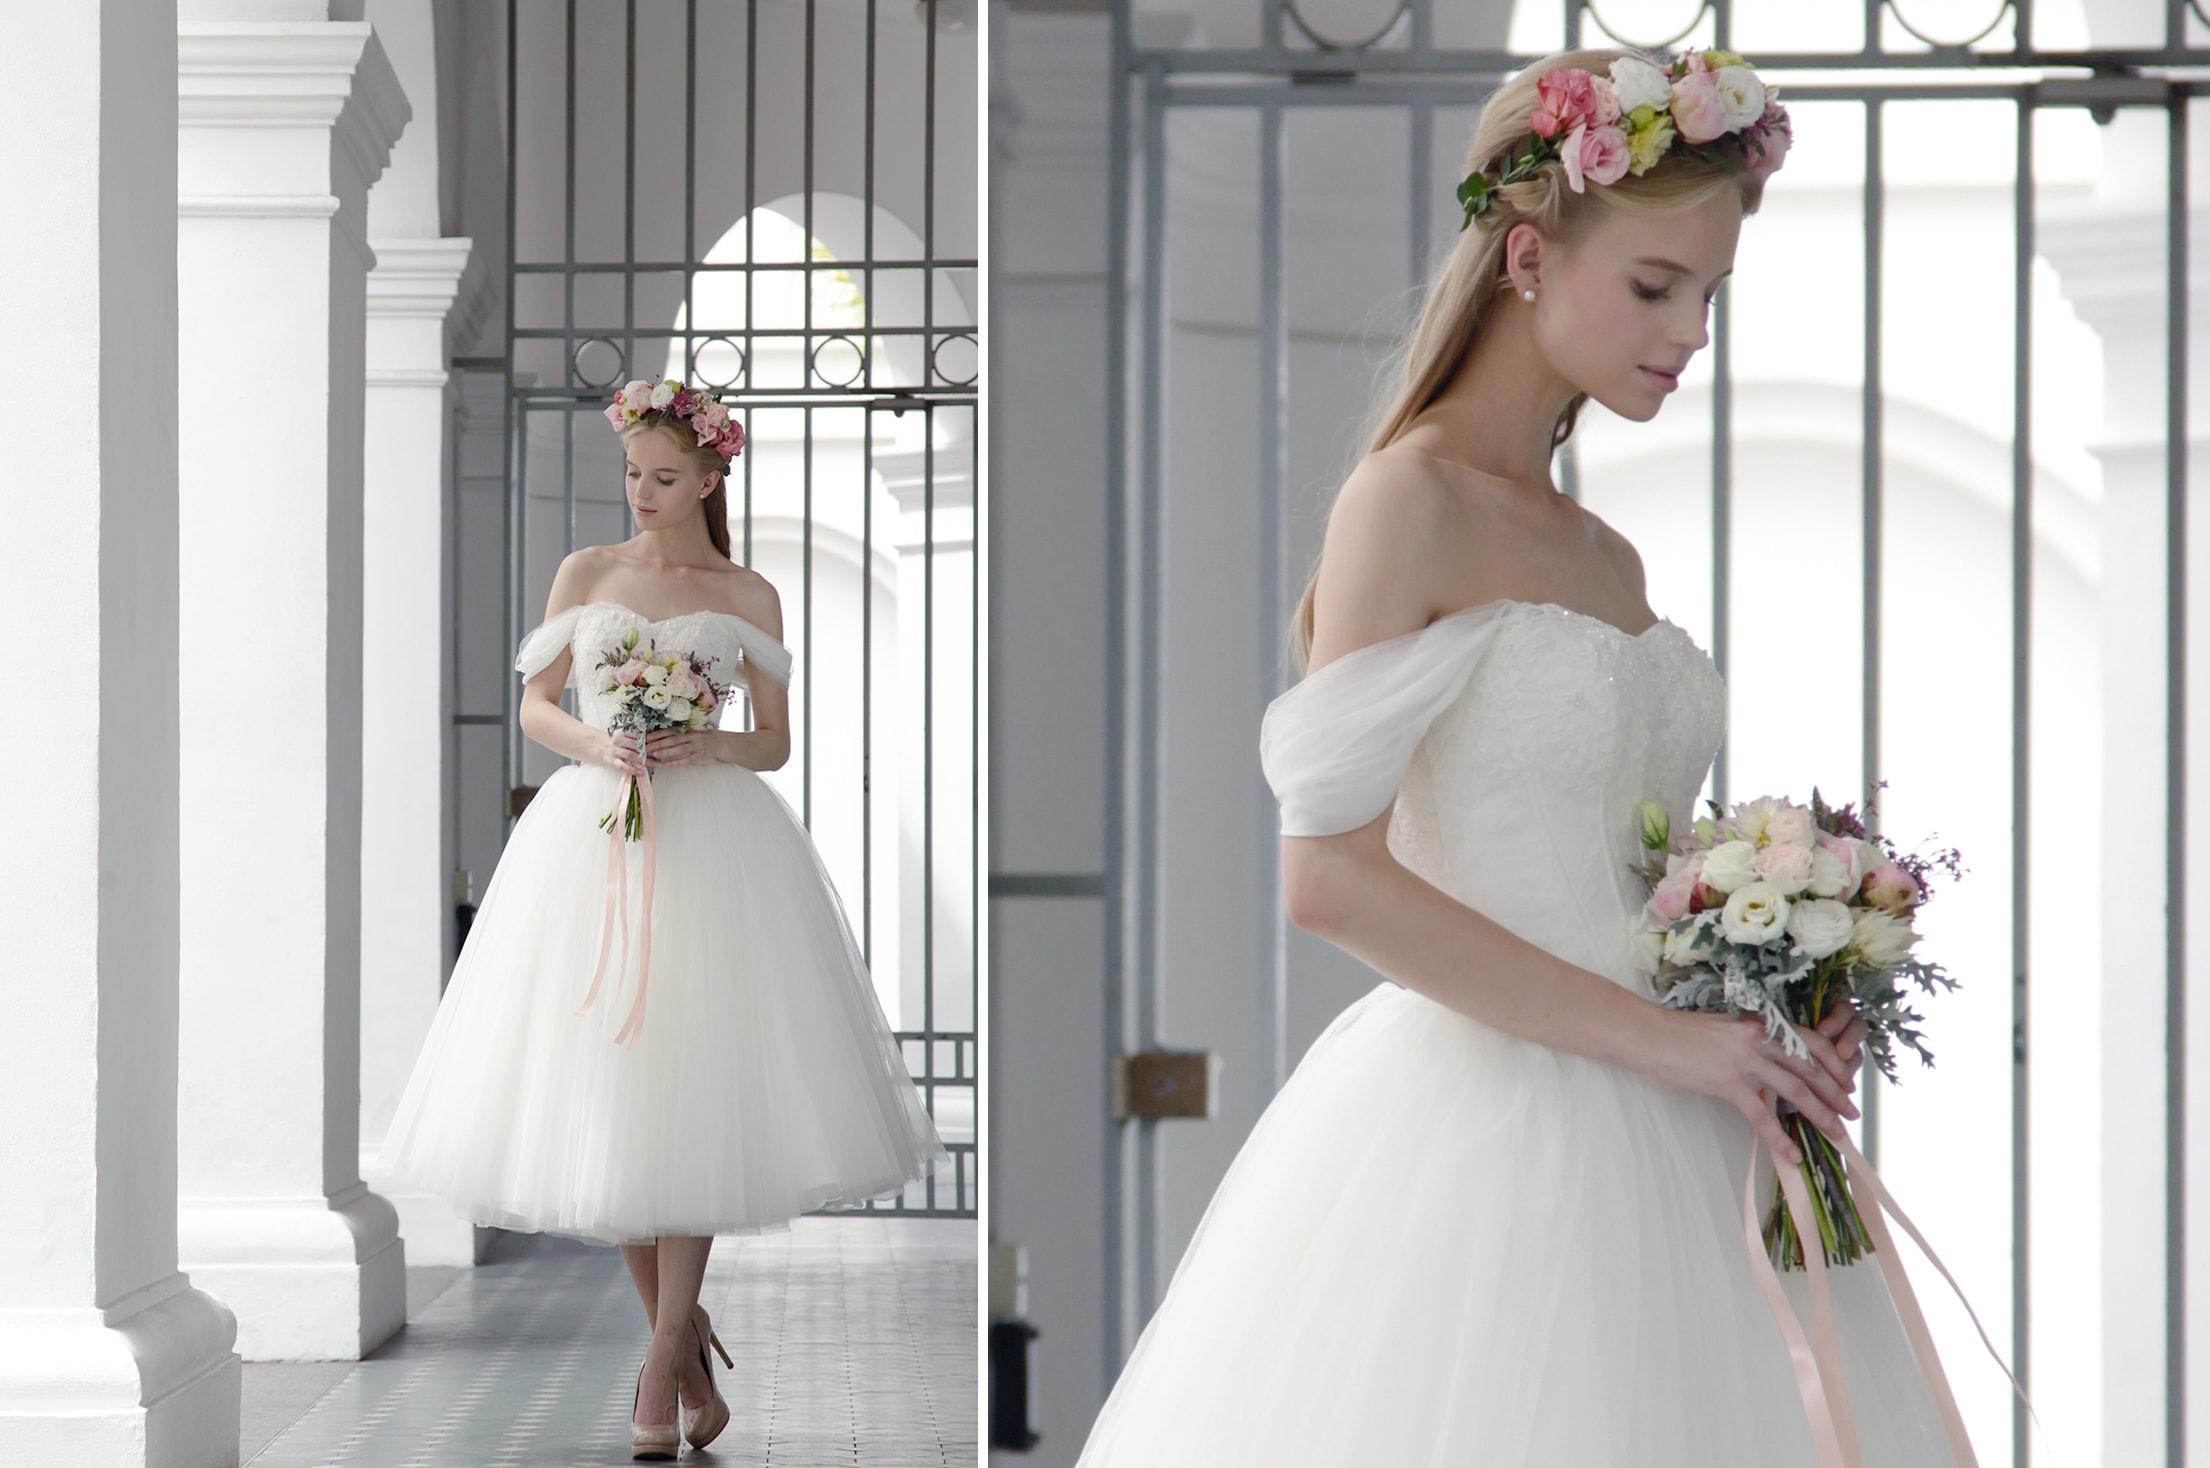 05-Z-Wedding-Off-shoulder-Engagement-Lace-Bodice-Tulle-Midi-Dress